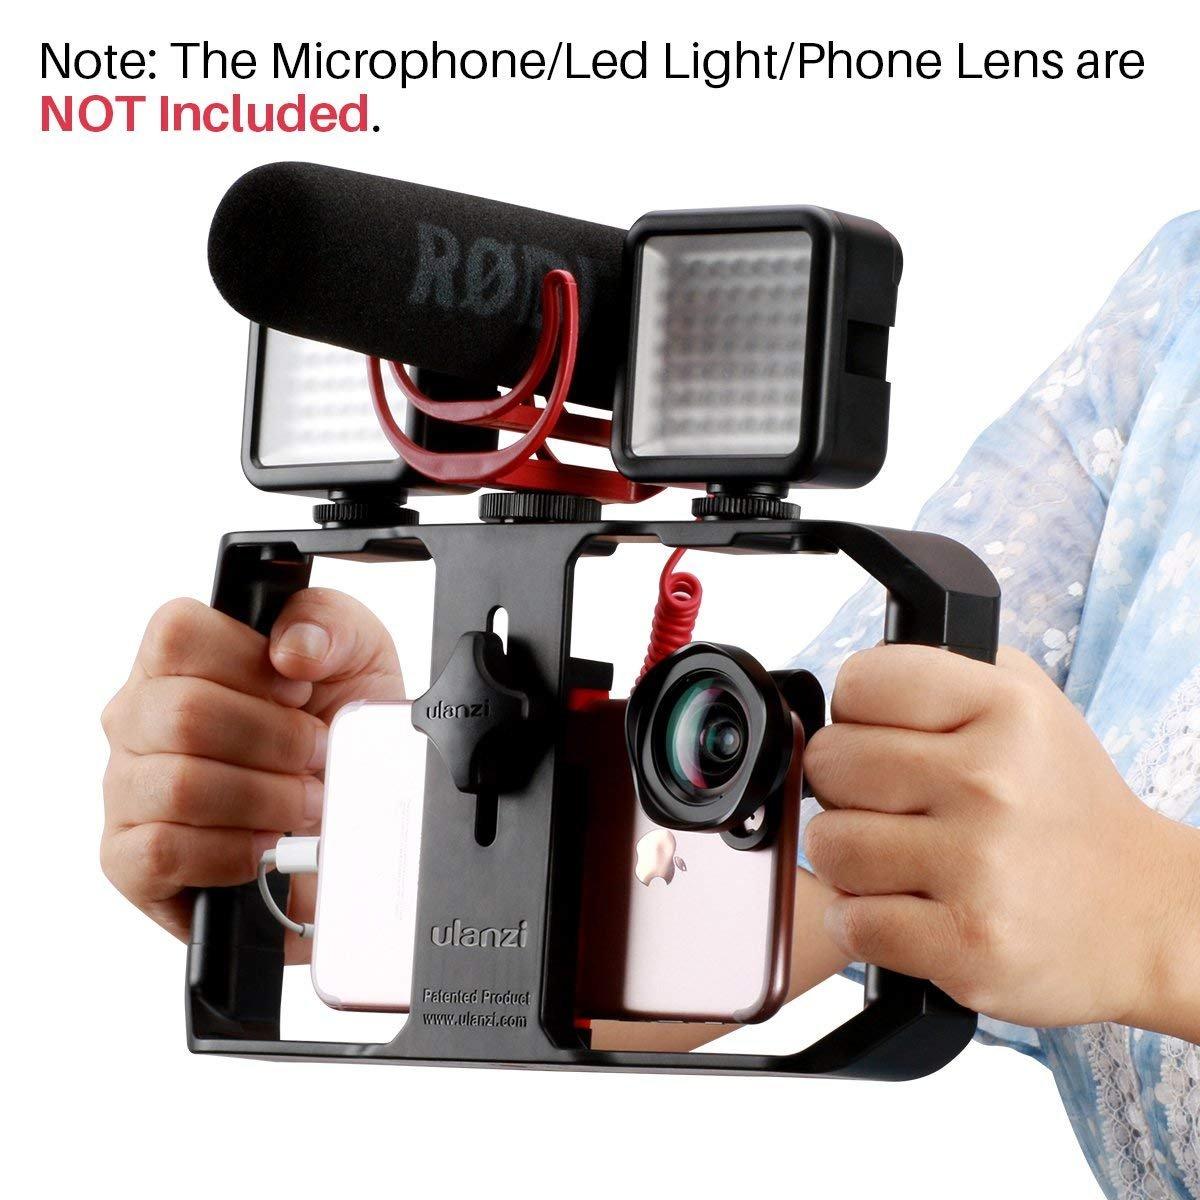 ULANZI U Rig Pro Smartphone Video Rig, Filmmaking Case, Phone Video Stabilizer Grip Stativ Soporte para Videomaker Film-Maker Videographer para iPhone XS XS MAX XR iPhone X 8 Plus Samsung: Amazon.es: Electrónica